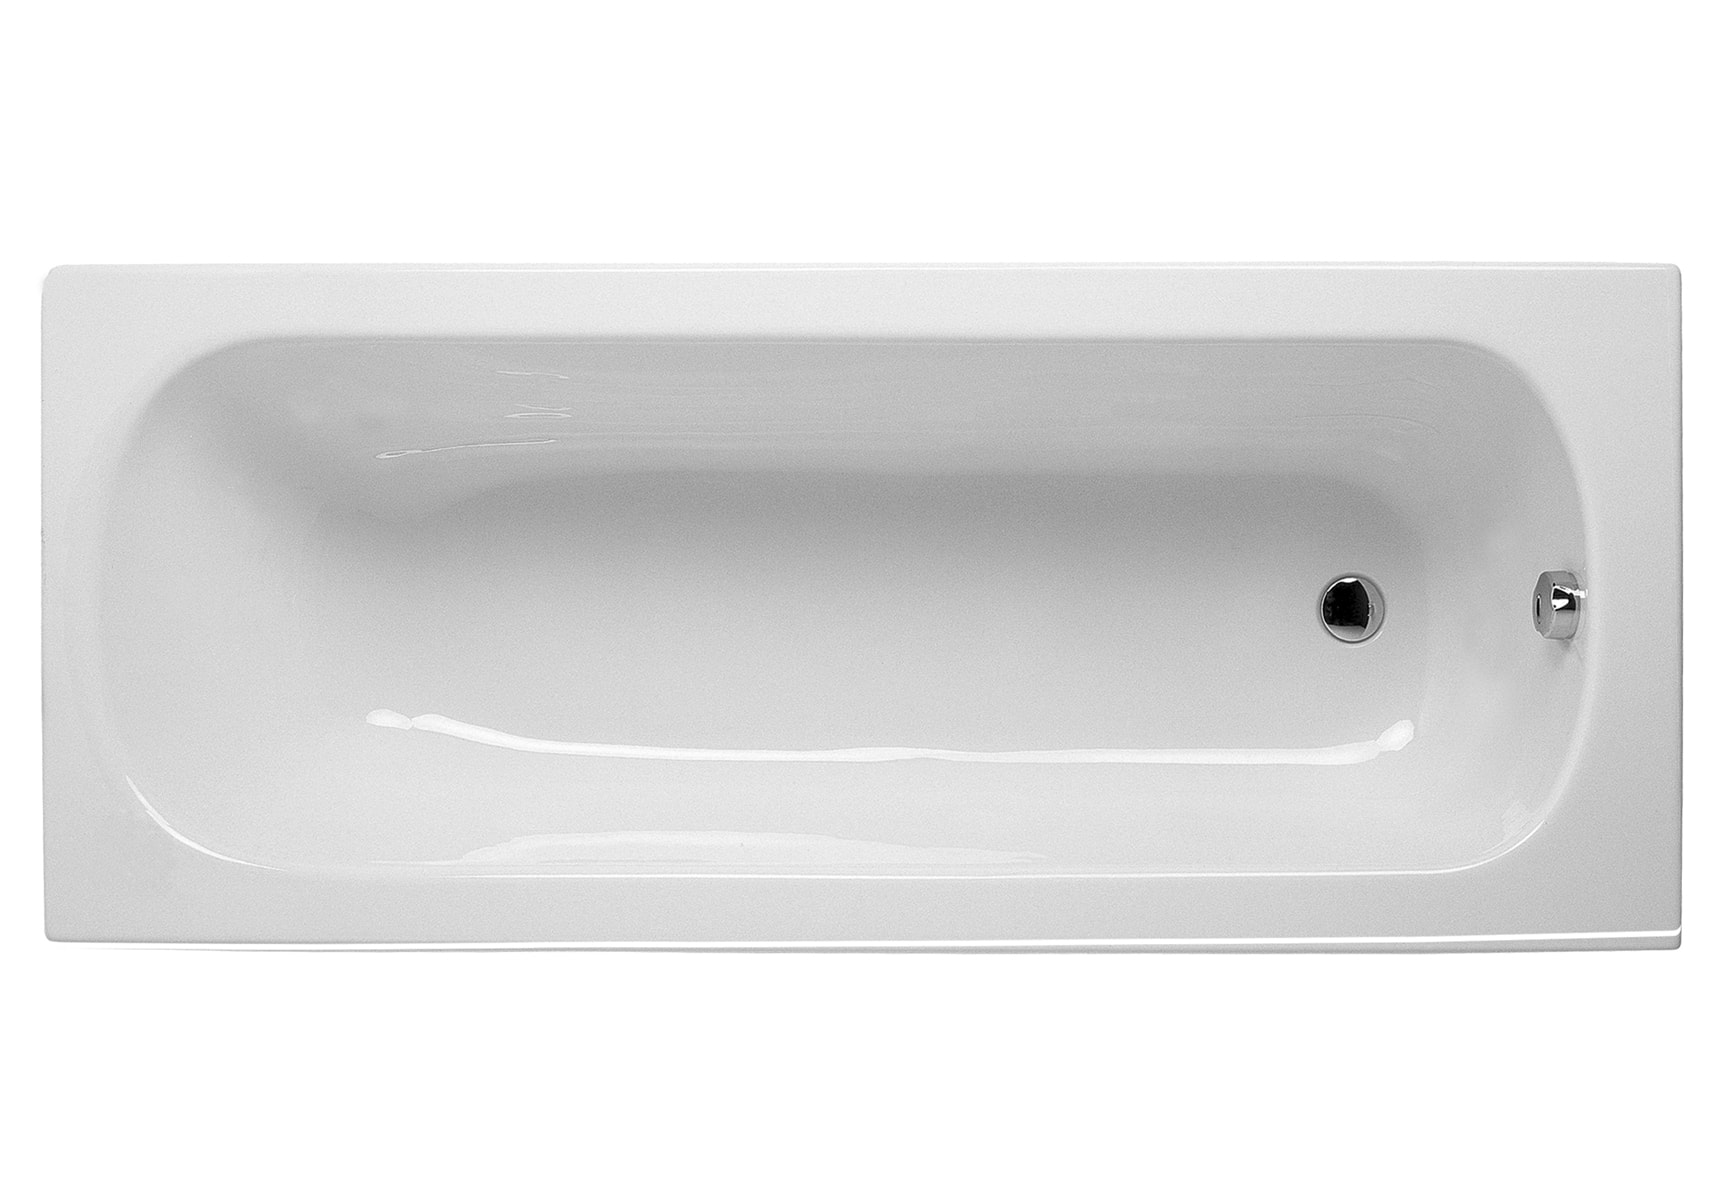 Eura 150x75cm Rectangular Bathtub